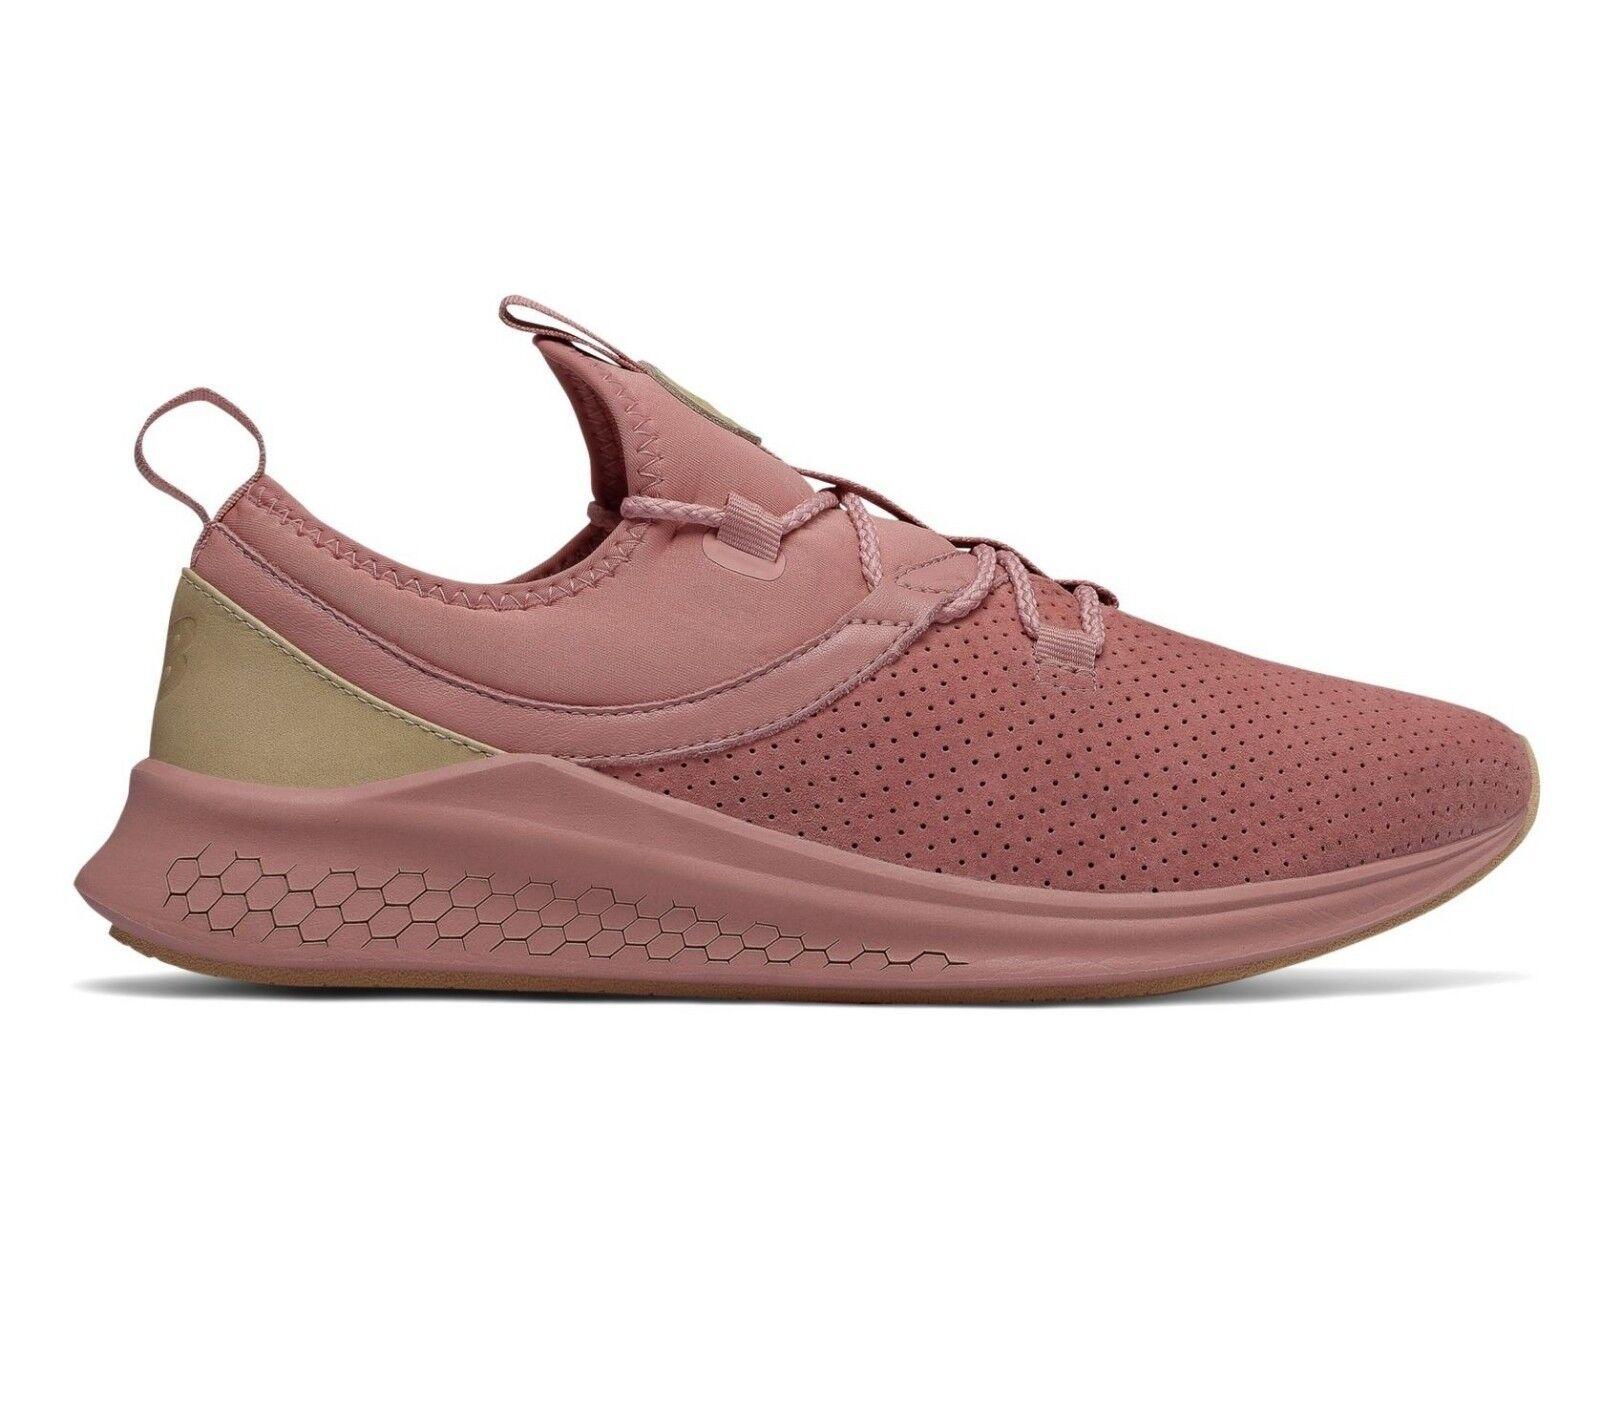 New Balance Fresh Foam Lazr Luxe Pink Tan ULAZRLA Mens shoes Size 10